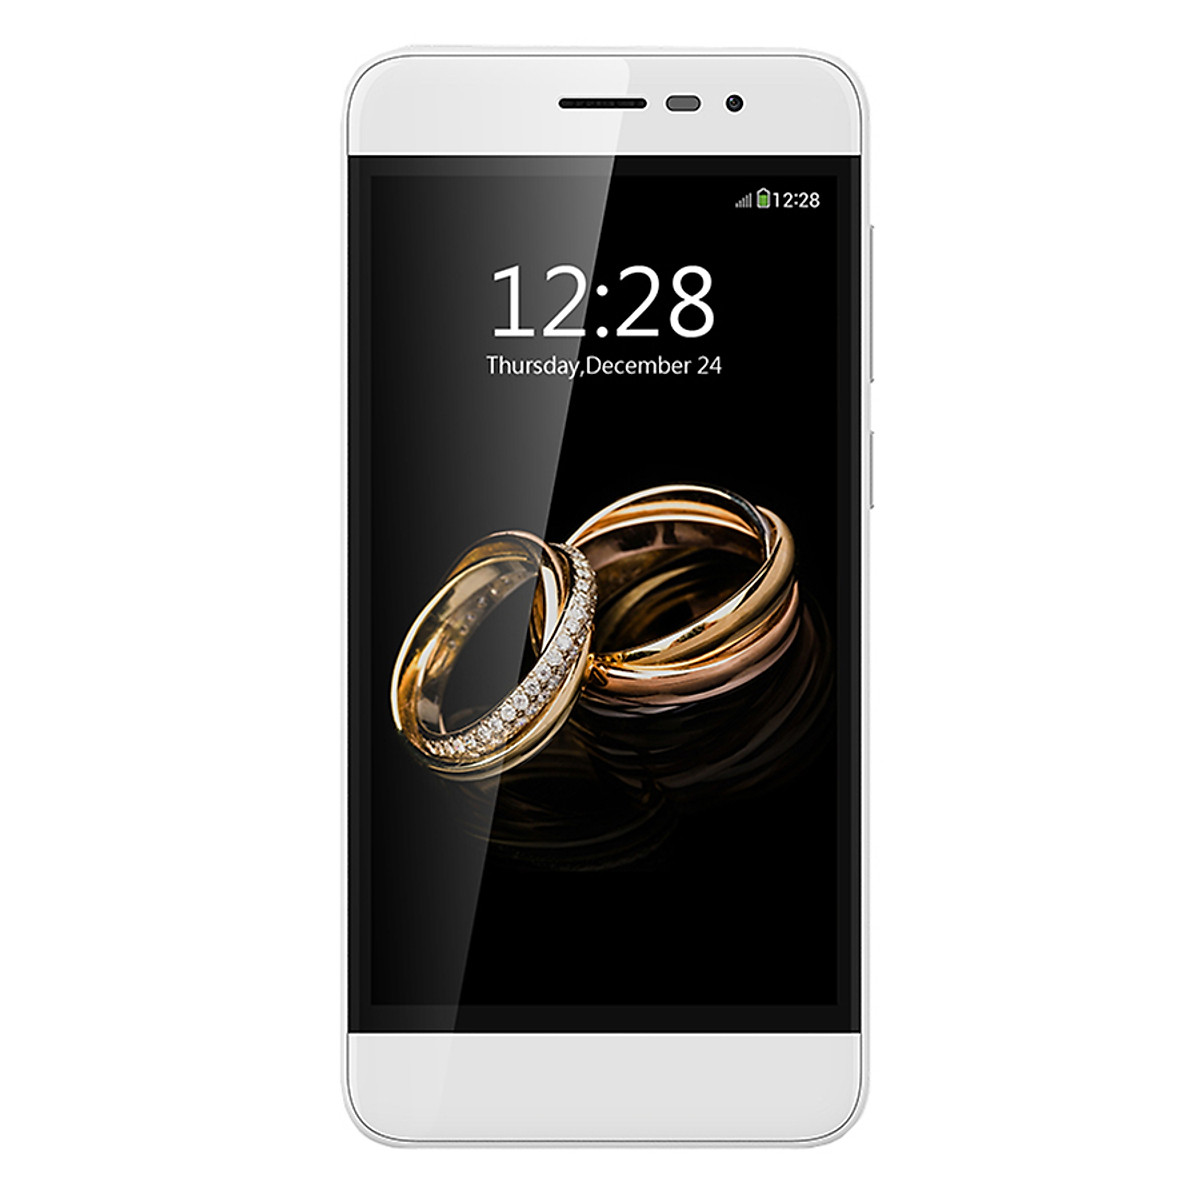 Smartphone Coolpad E561